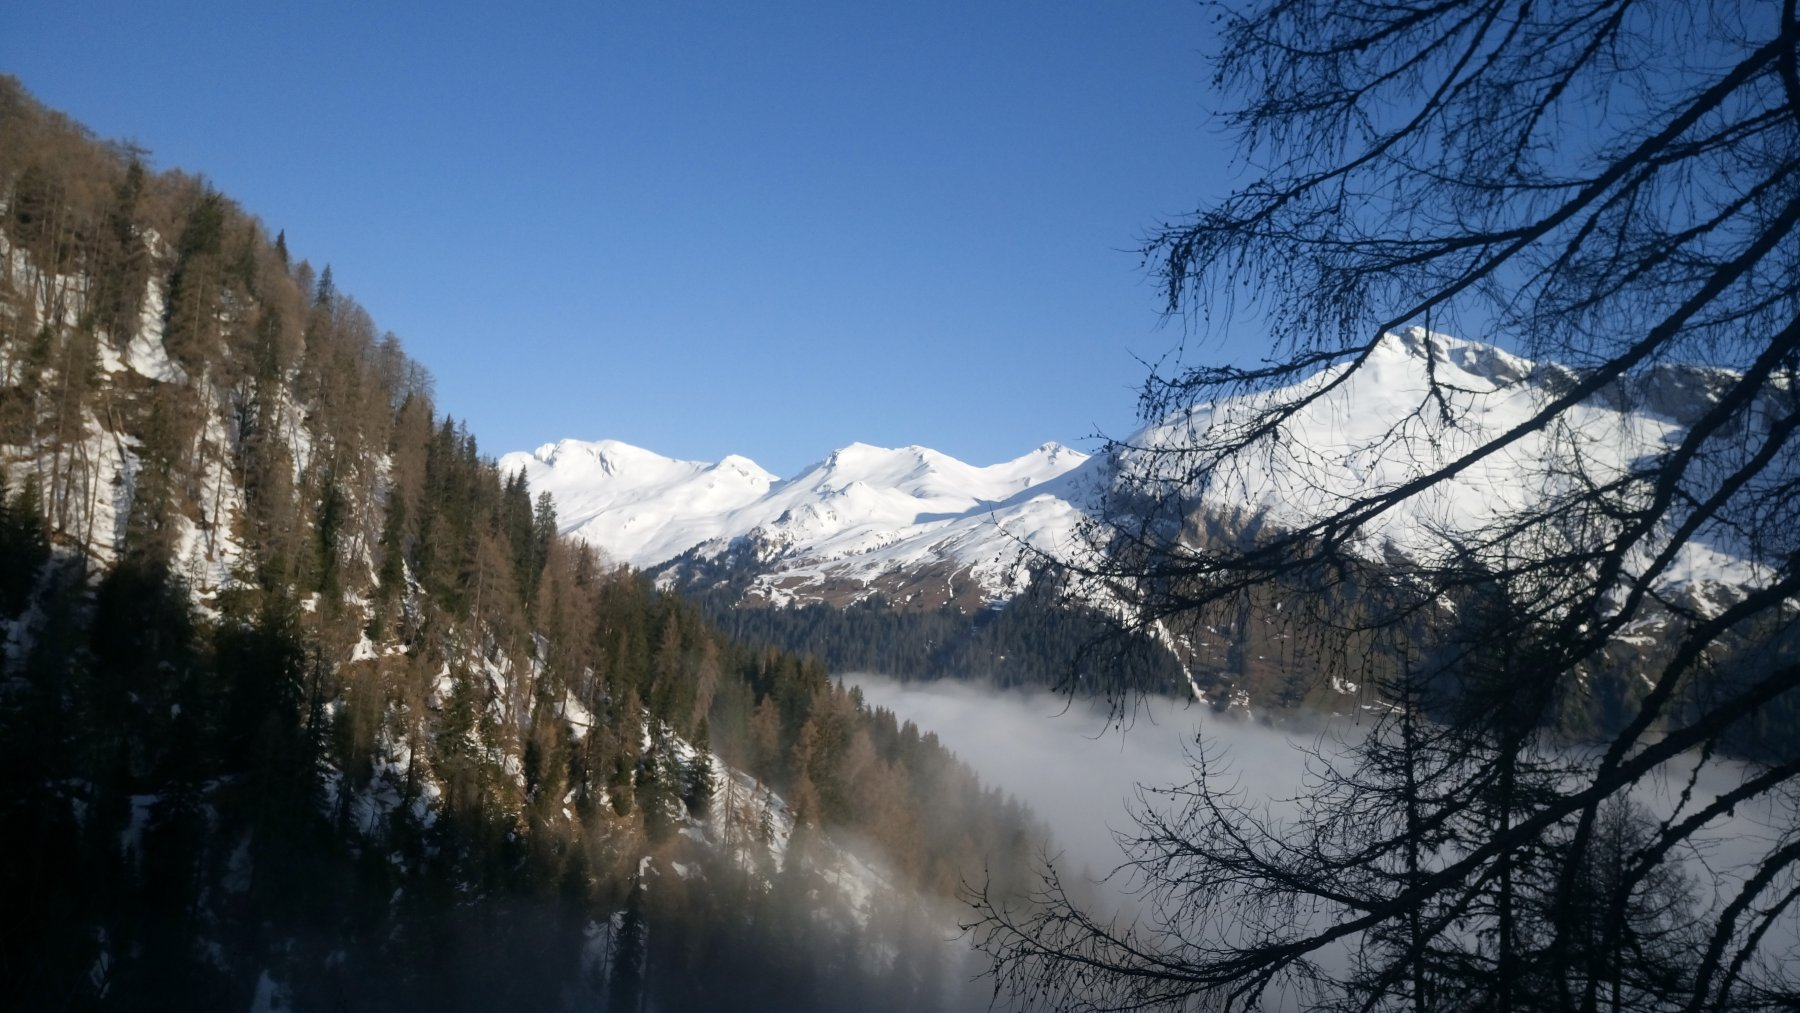 Vista dal sentiero verso le montagne sopra Nufenen